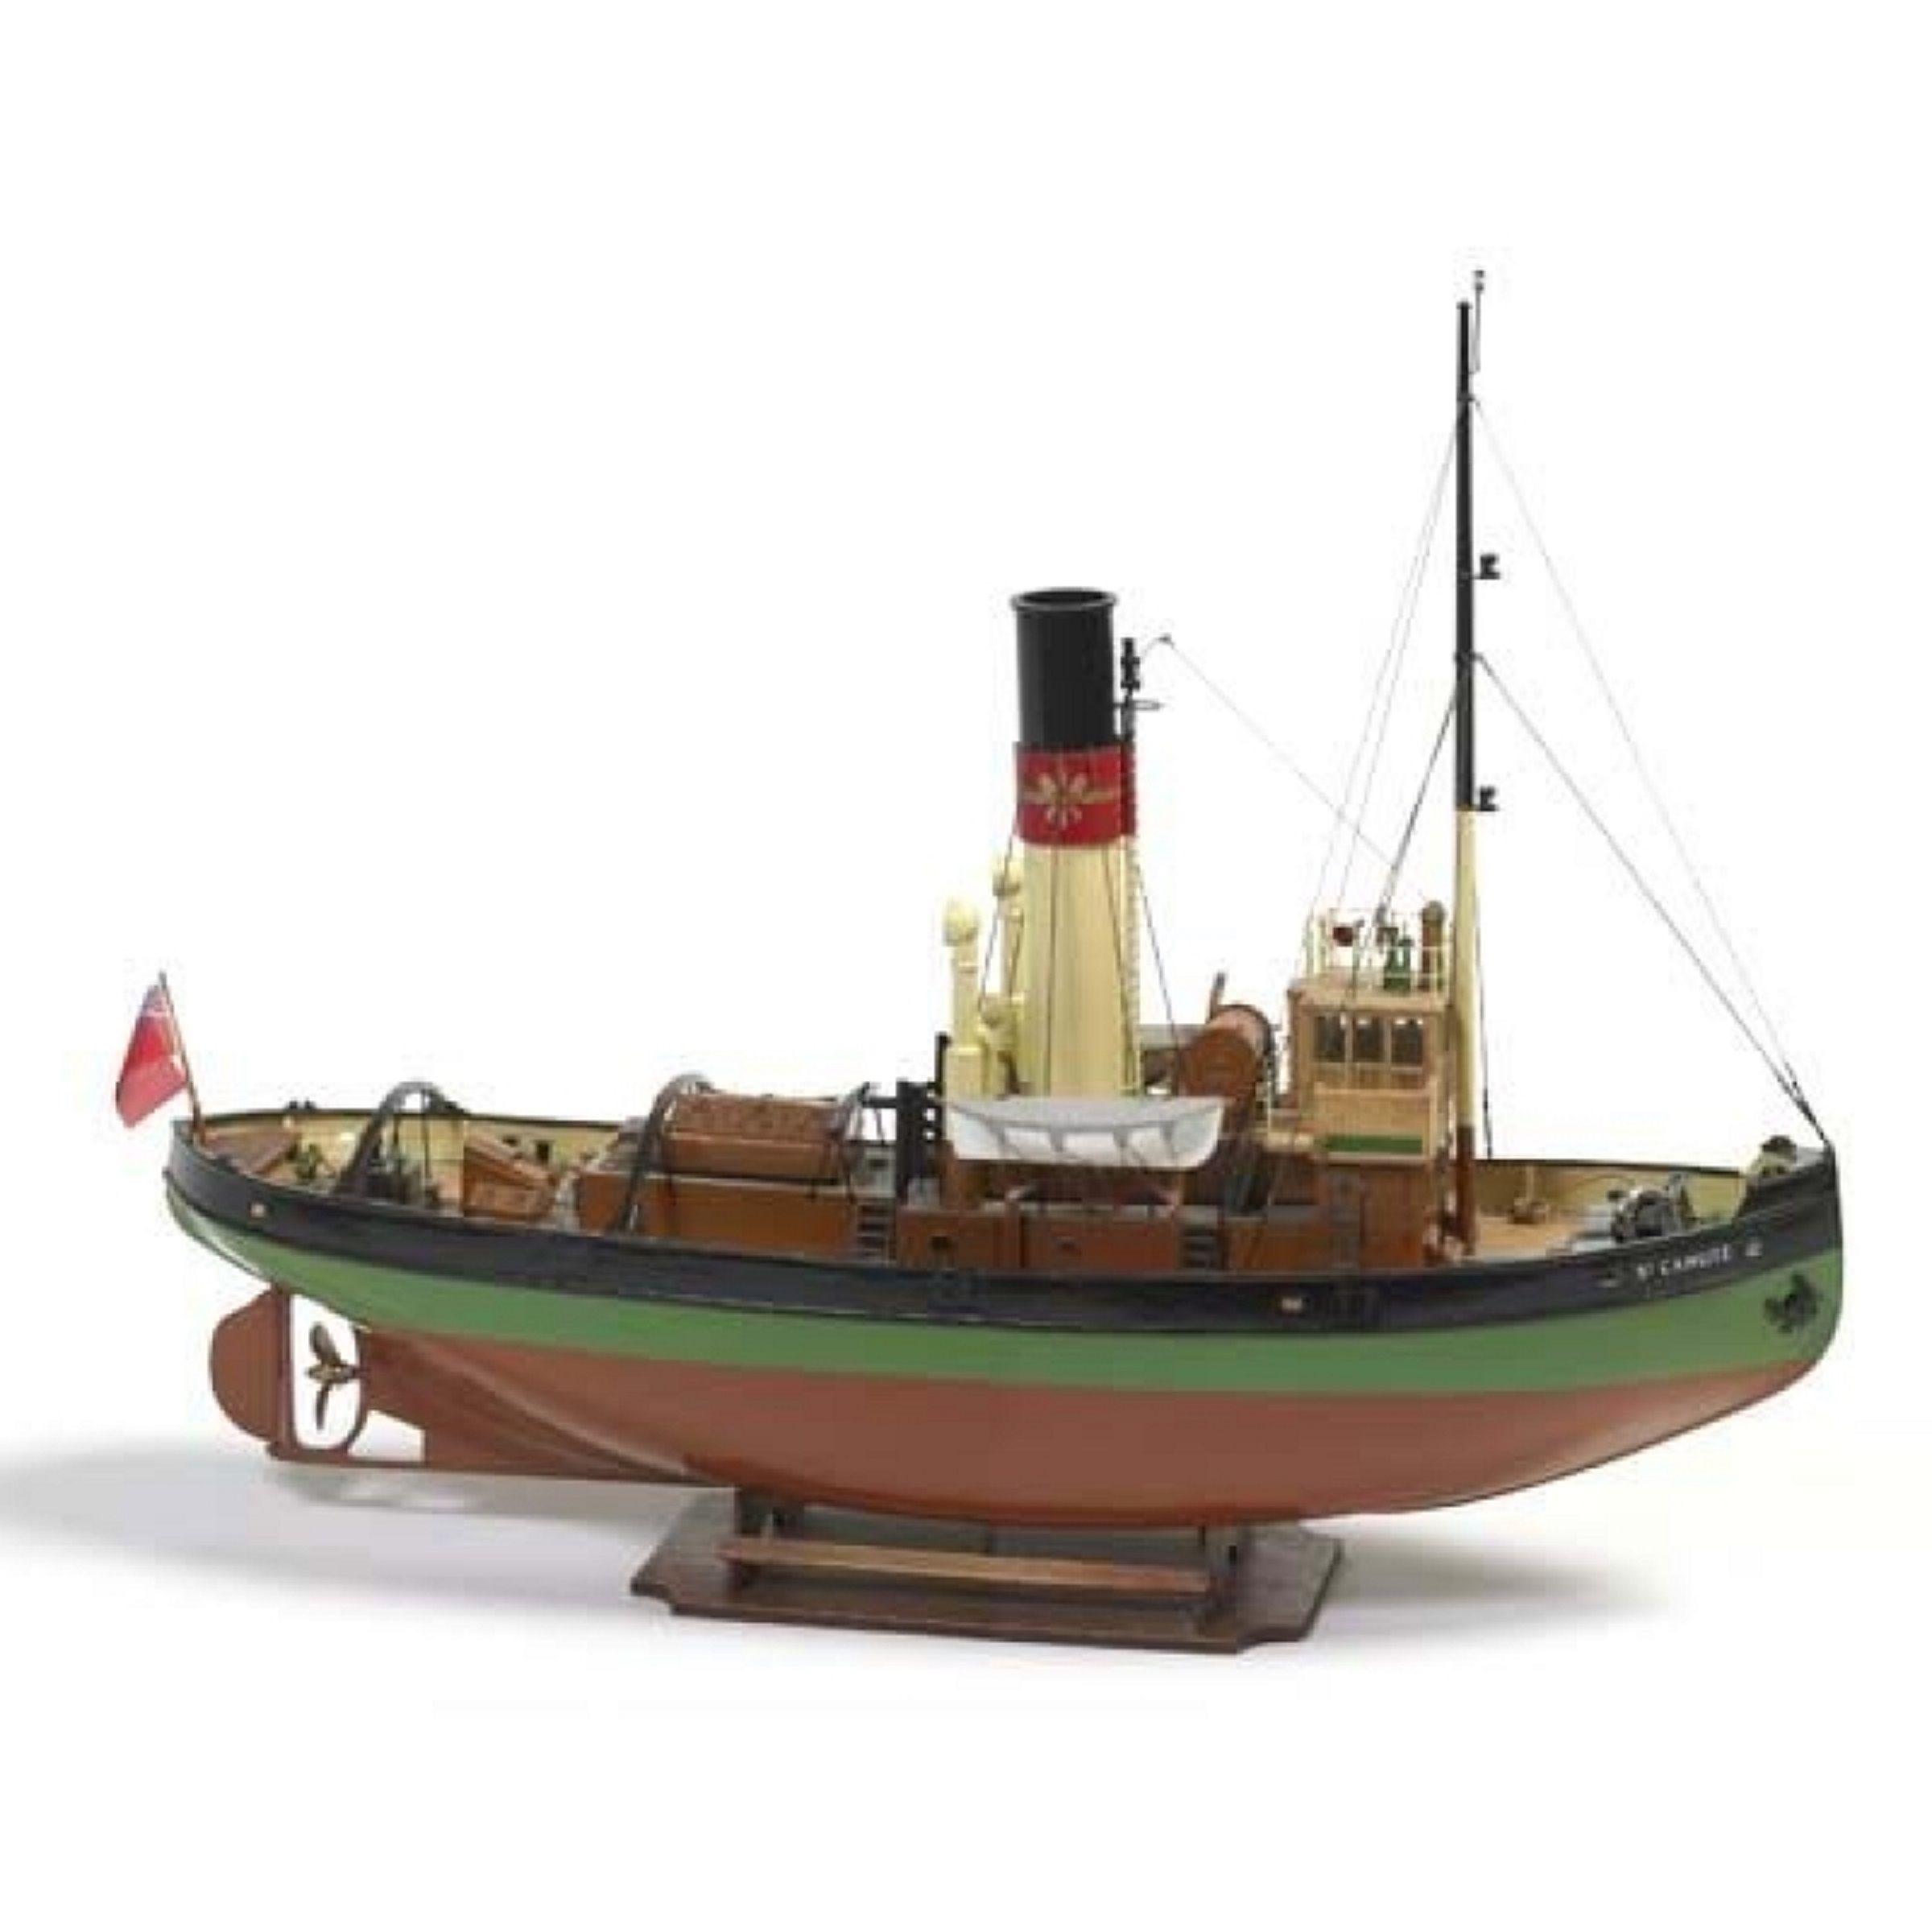 St Canute Model Boat Kit - Billing Boats (B700)